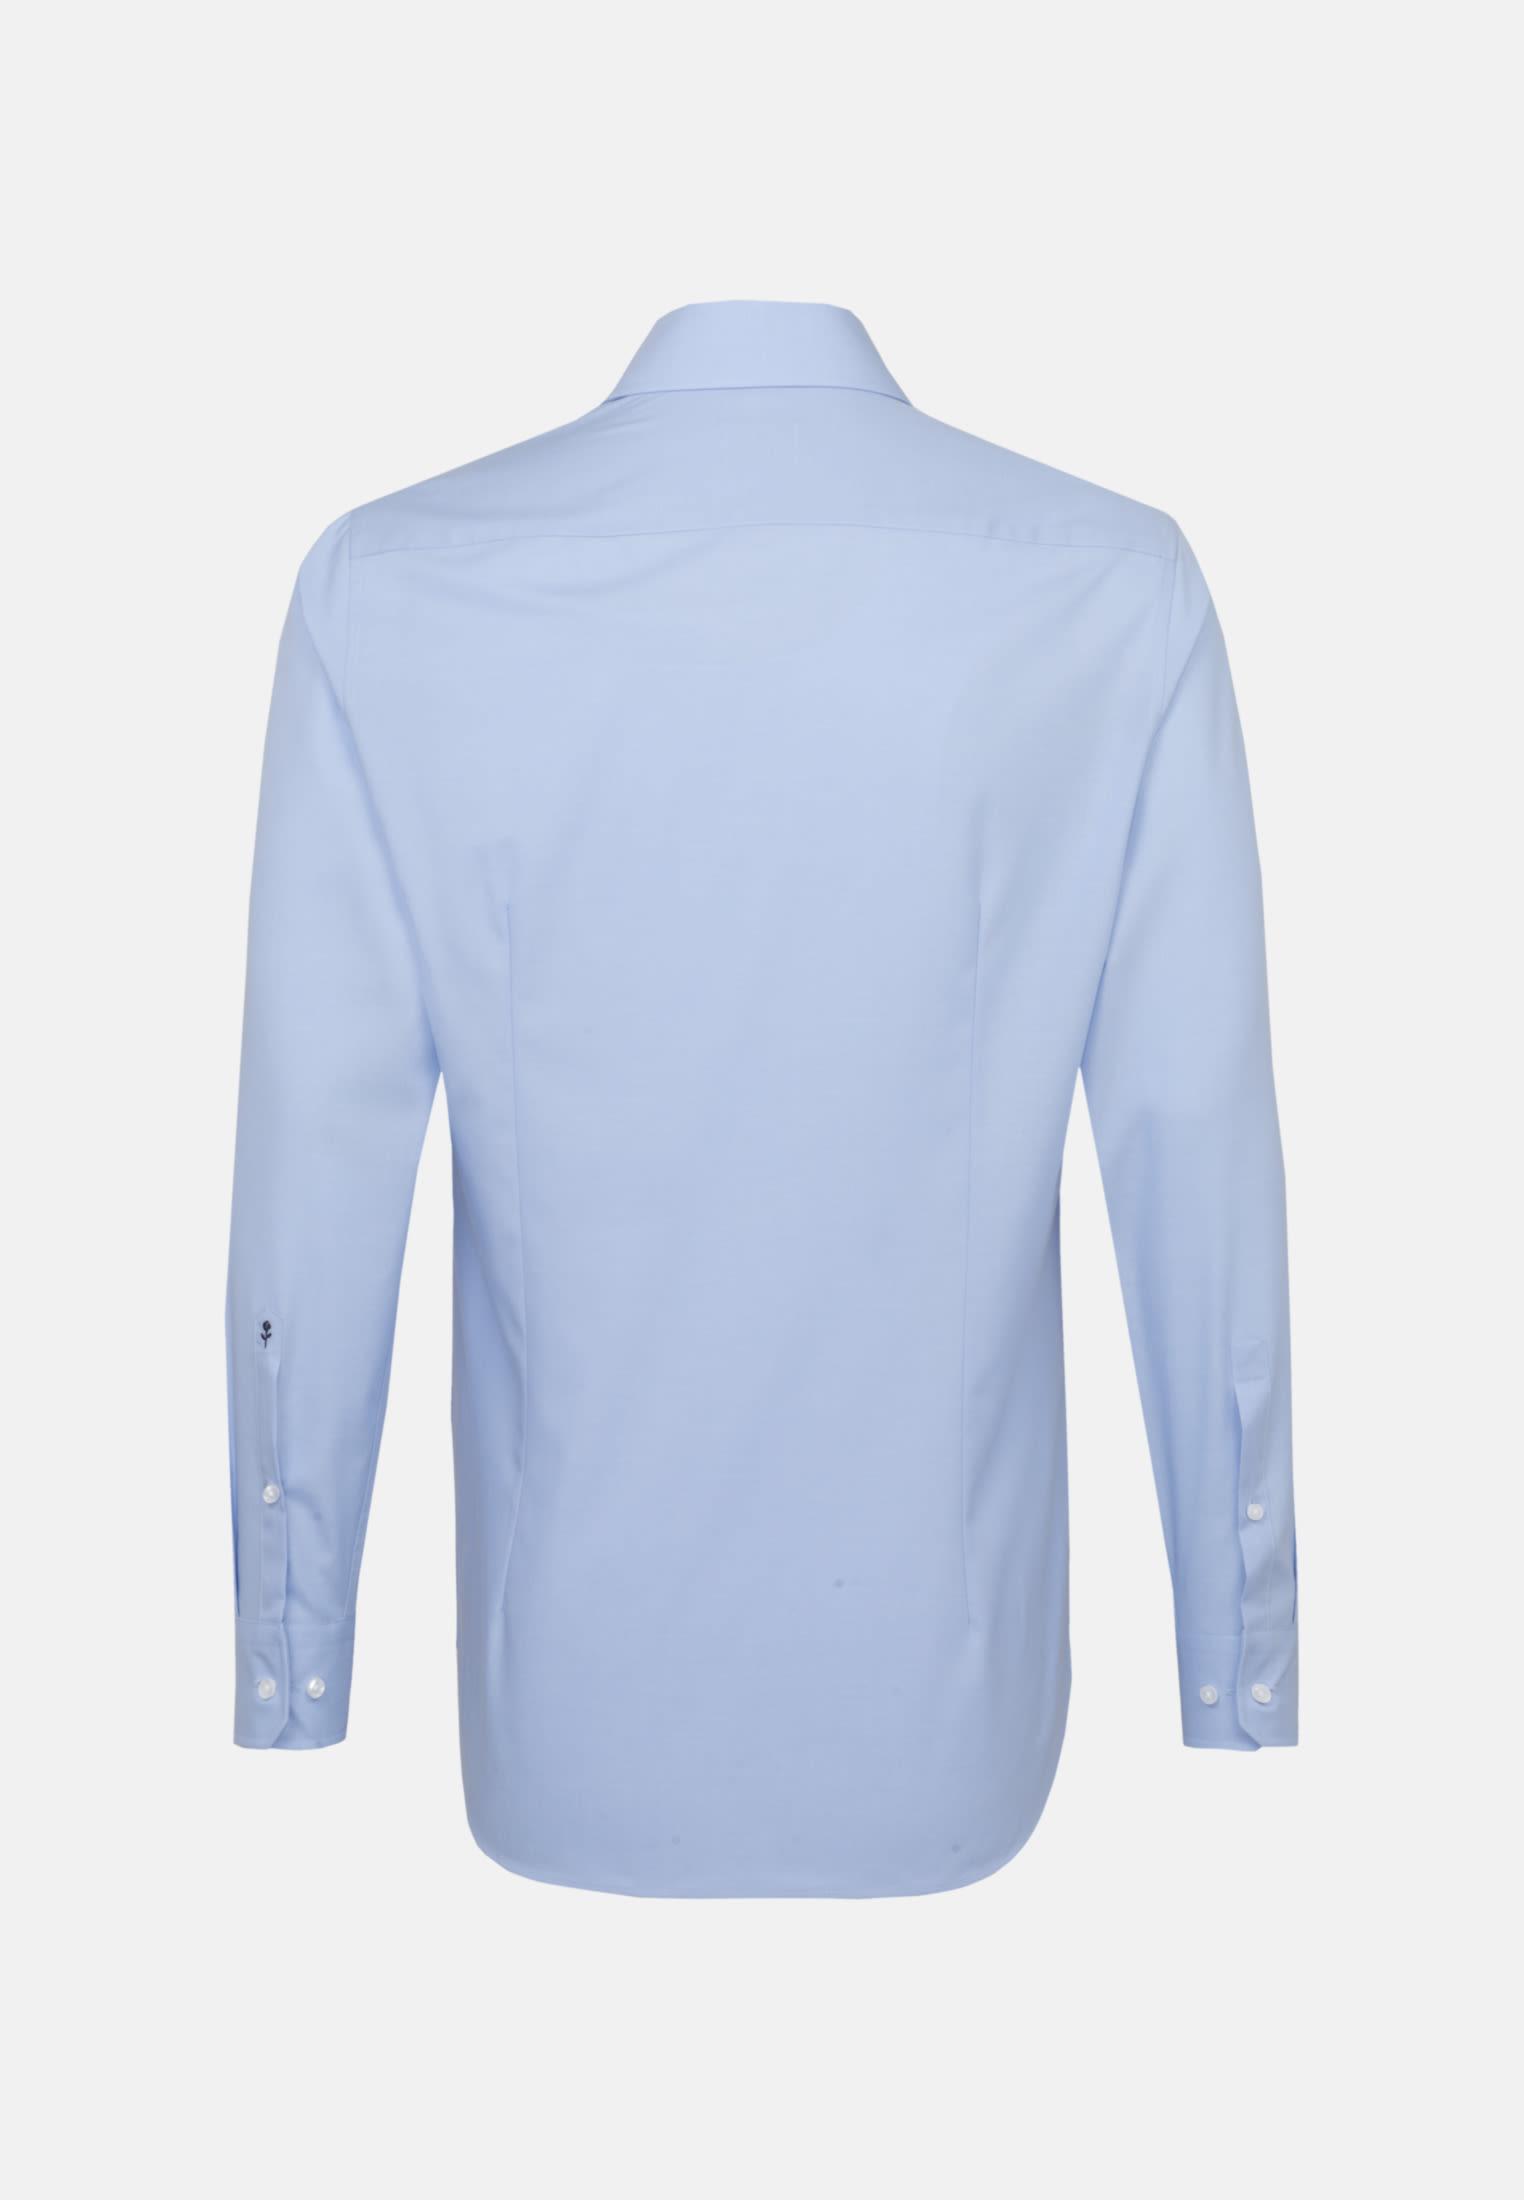 Bügelfreies Fil a fil Business Hemd in Shaped mit Kentkragen in Hellblau |  Seidensticker Onlineshop